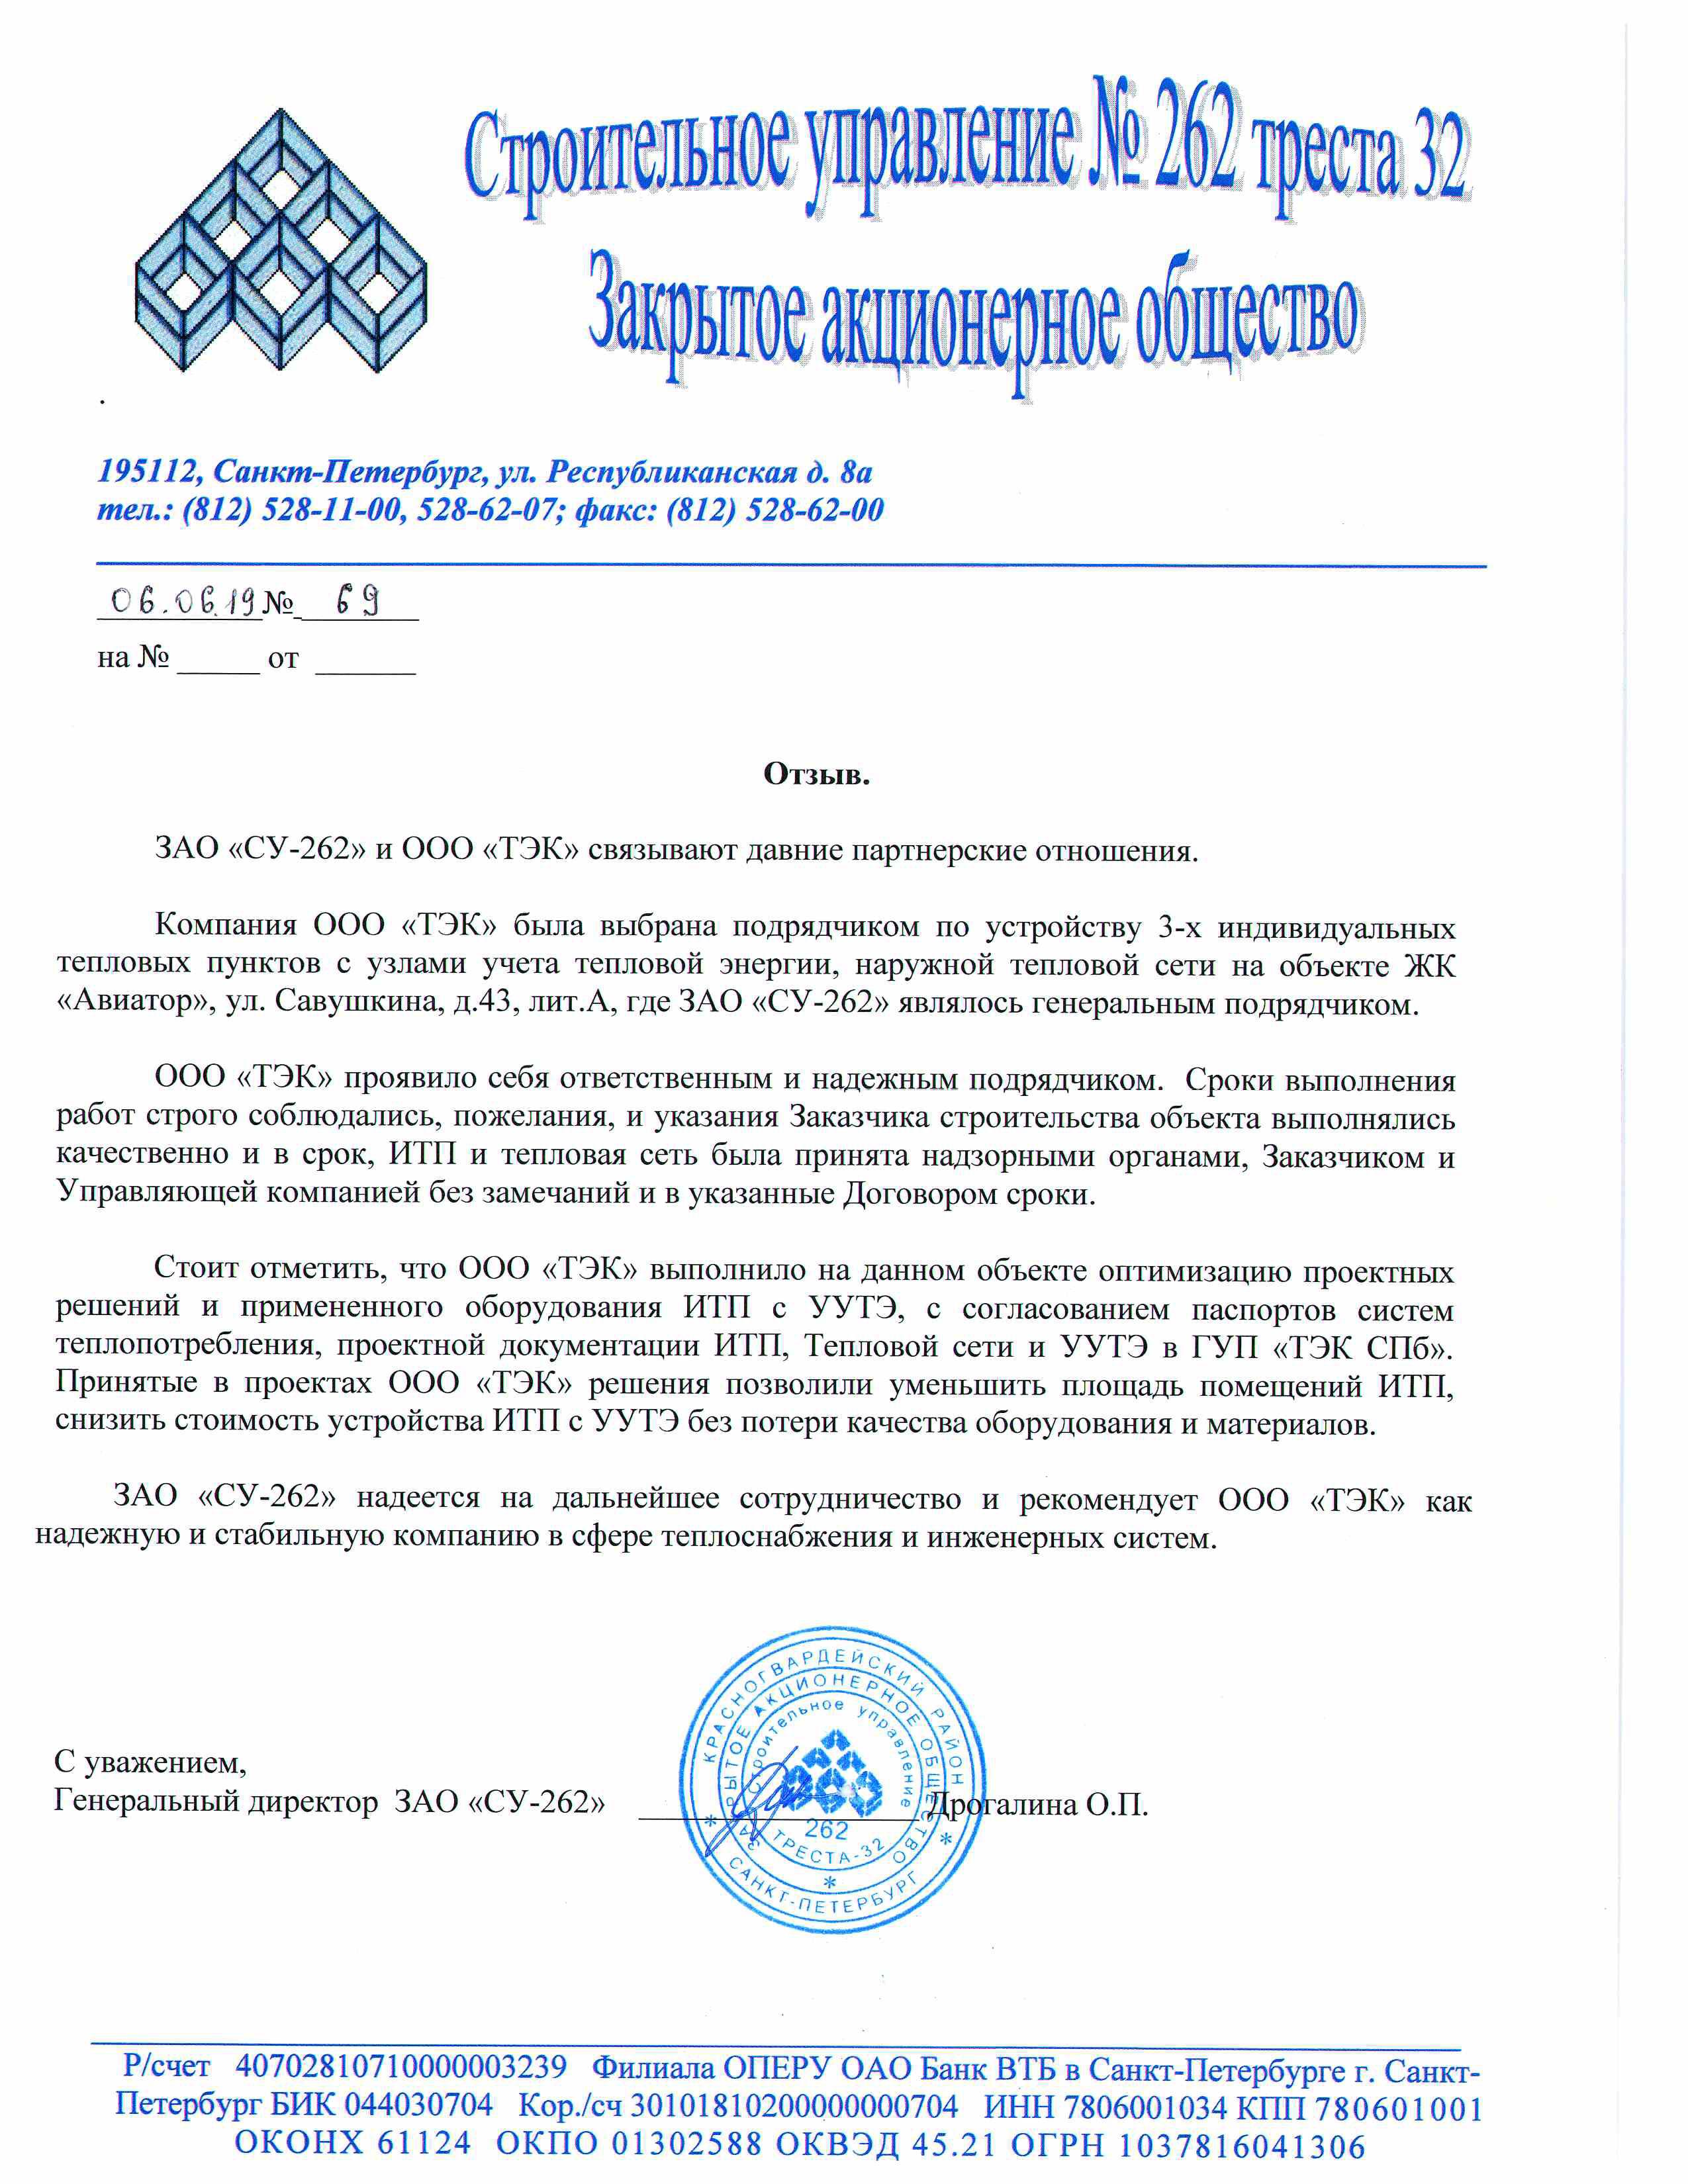 Отзыв о сотрудничестве с ООО ТЭК  от ЗАО СУ-262 Треста 32